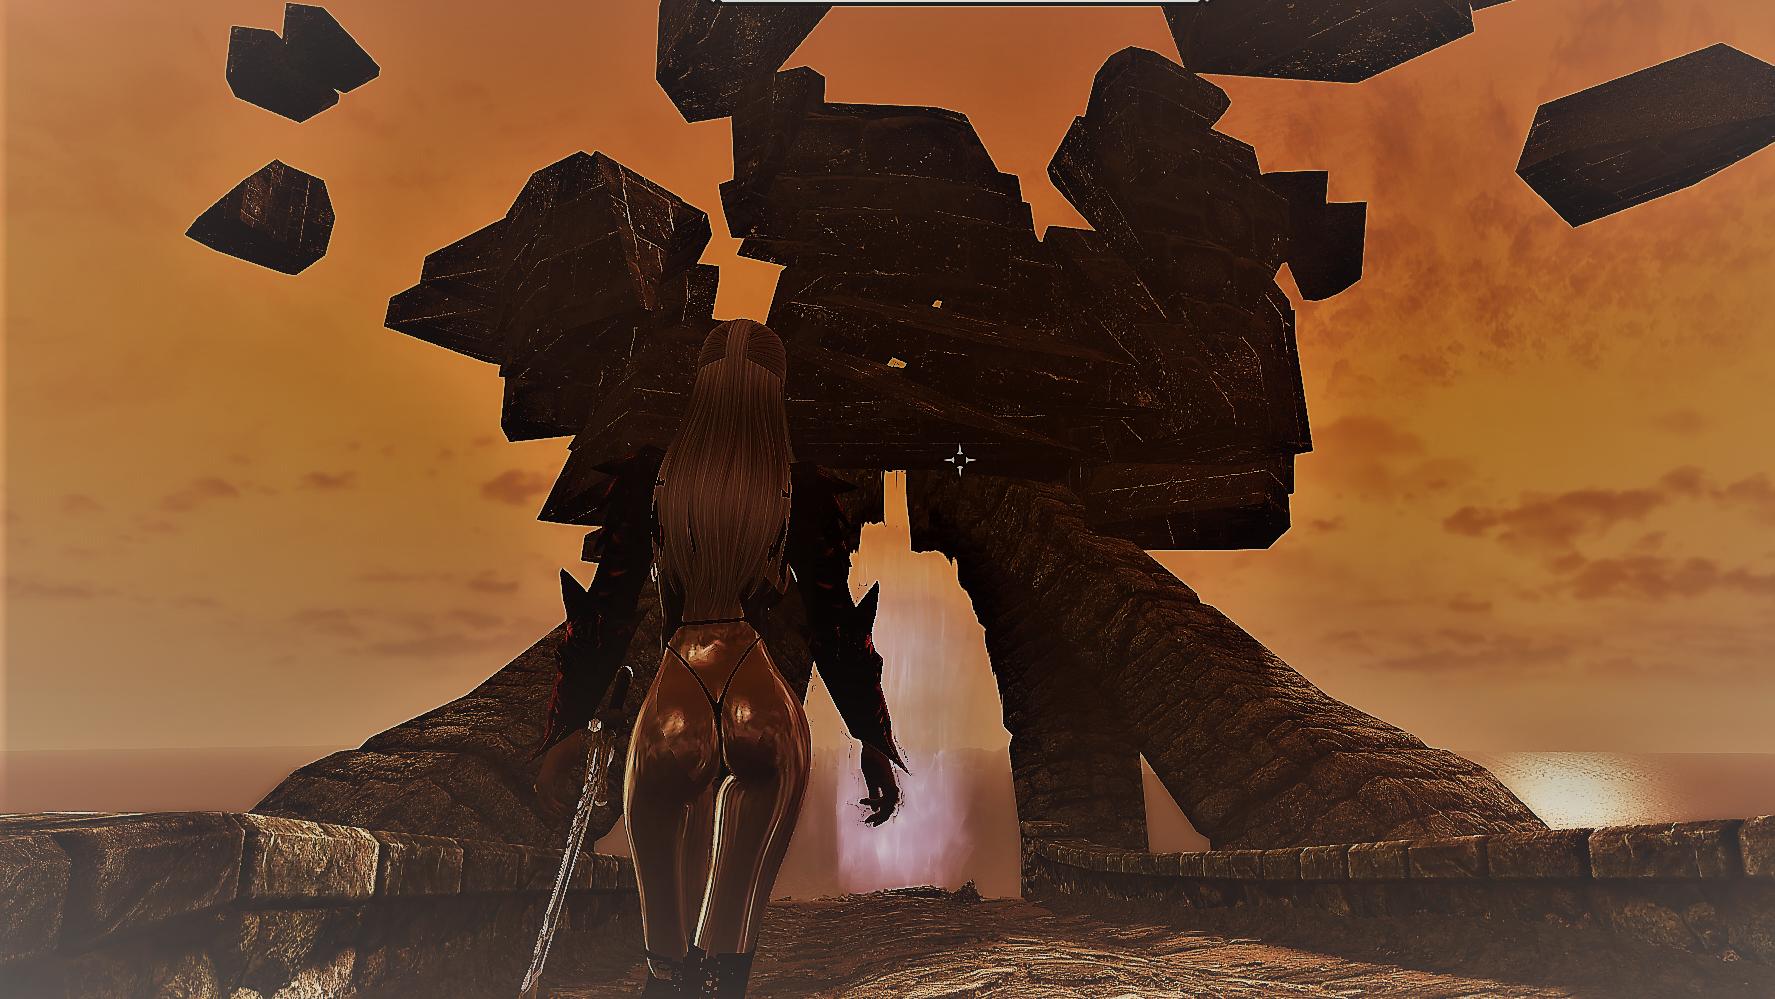 Tes V - Skyrim Screenshot 2018.06.19 - 19.25.33.97.png - Elder Scrolls 5: Skyrim, the